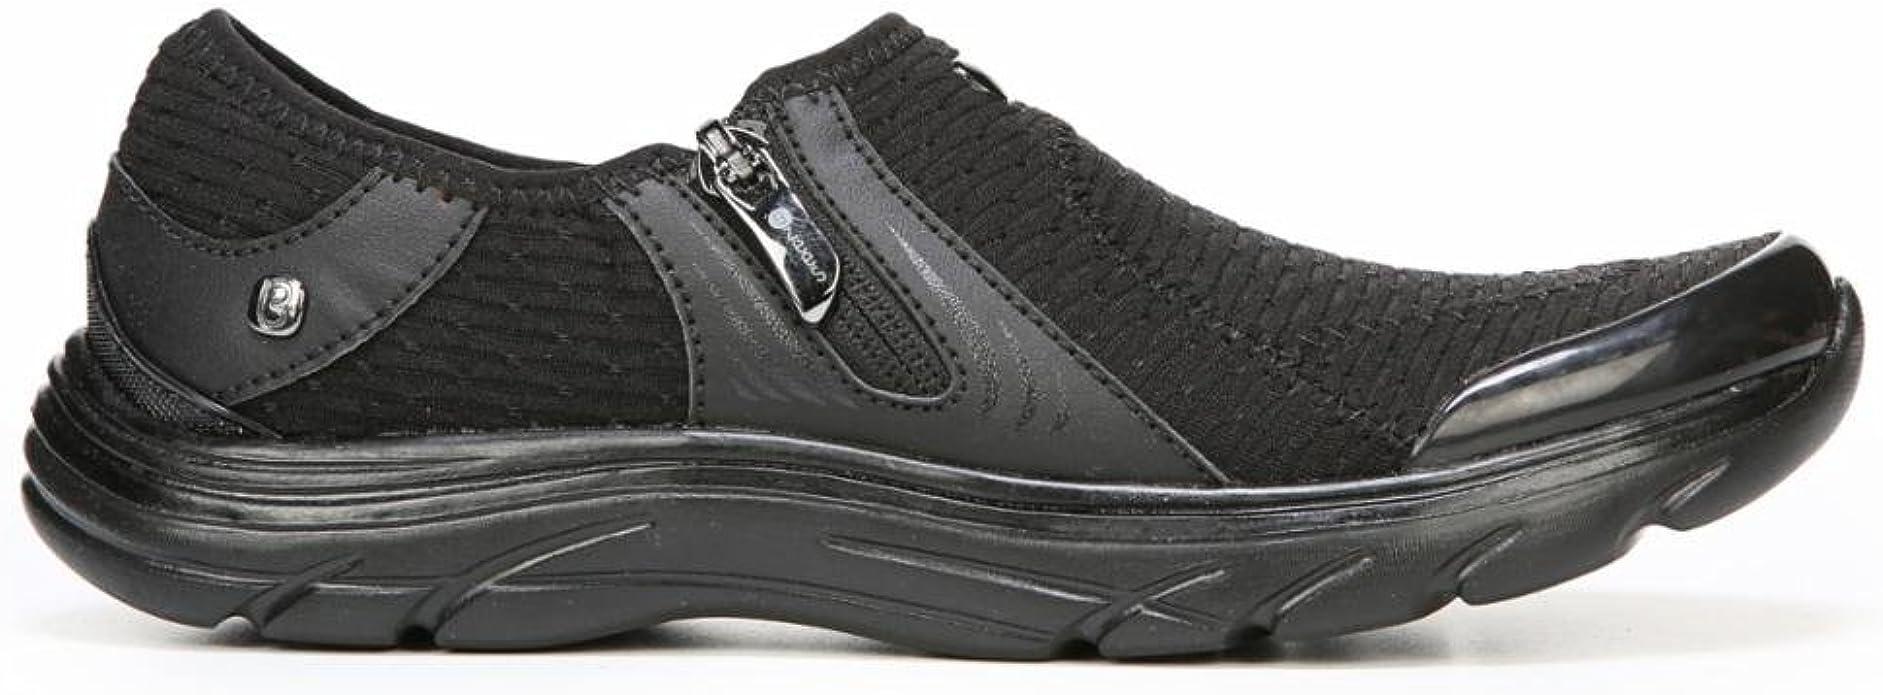 BZees Women's, Balance Slip on Shoe